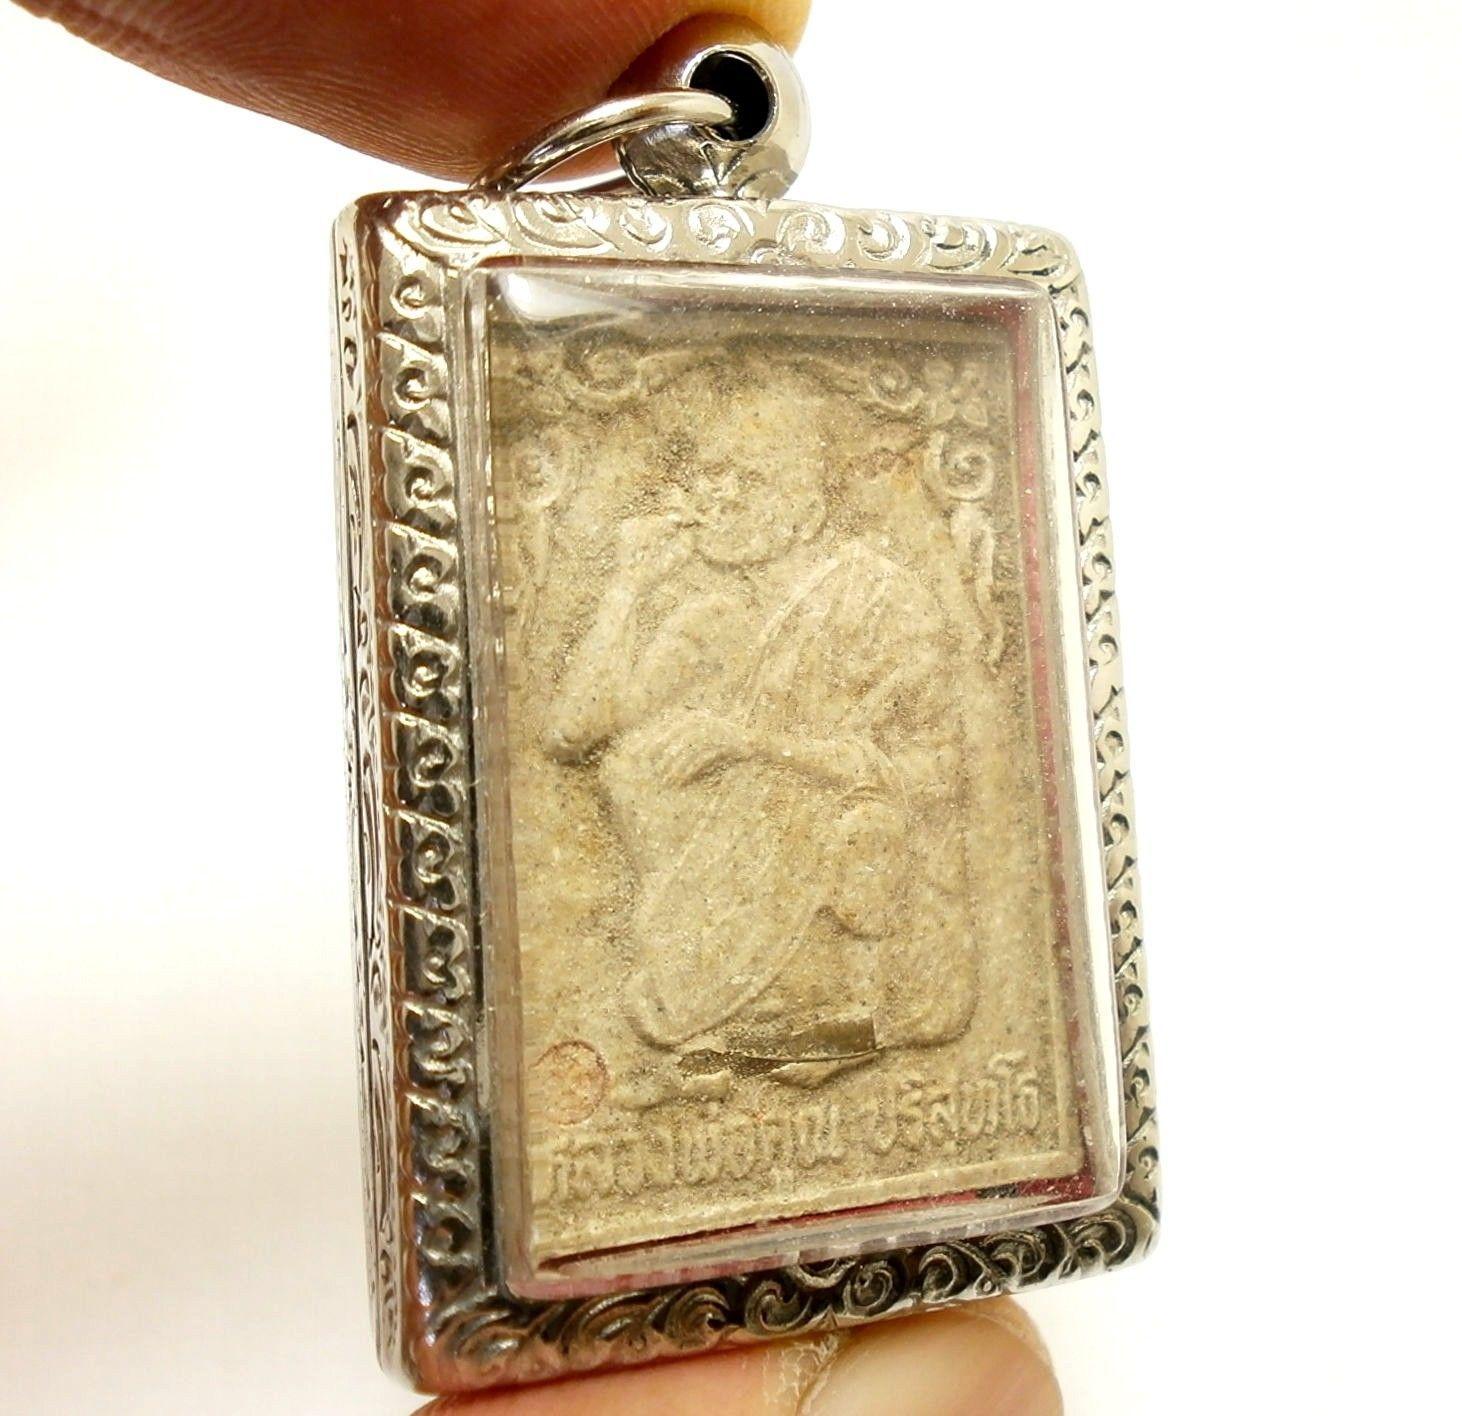 THAI BUDDHA AMULET LP KOON MAGIC TAKRUT MULTIPLY MONEY LUCKY RICH MONEY MULTIPLY